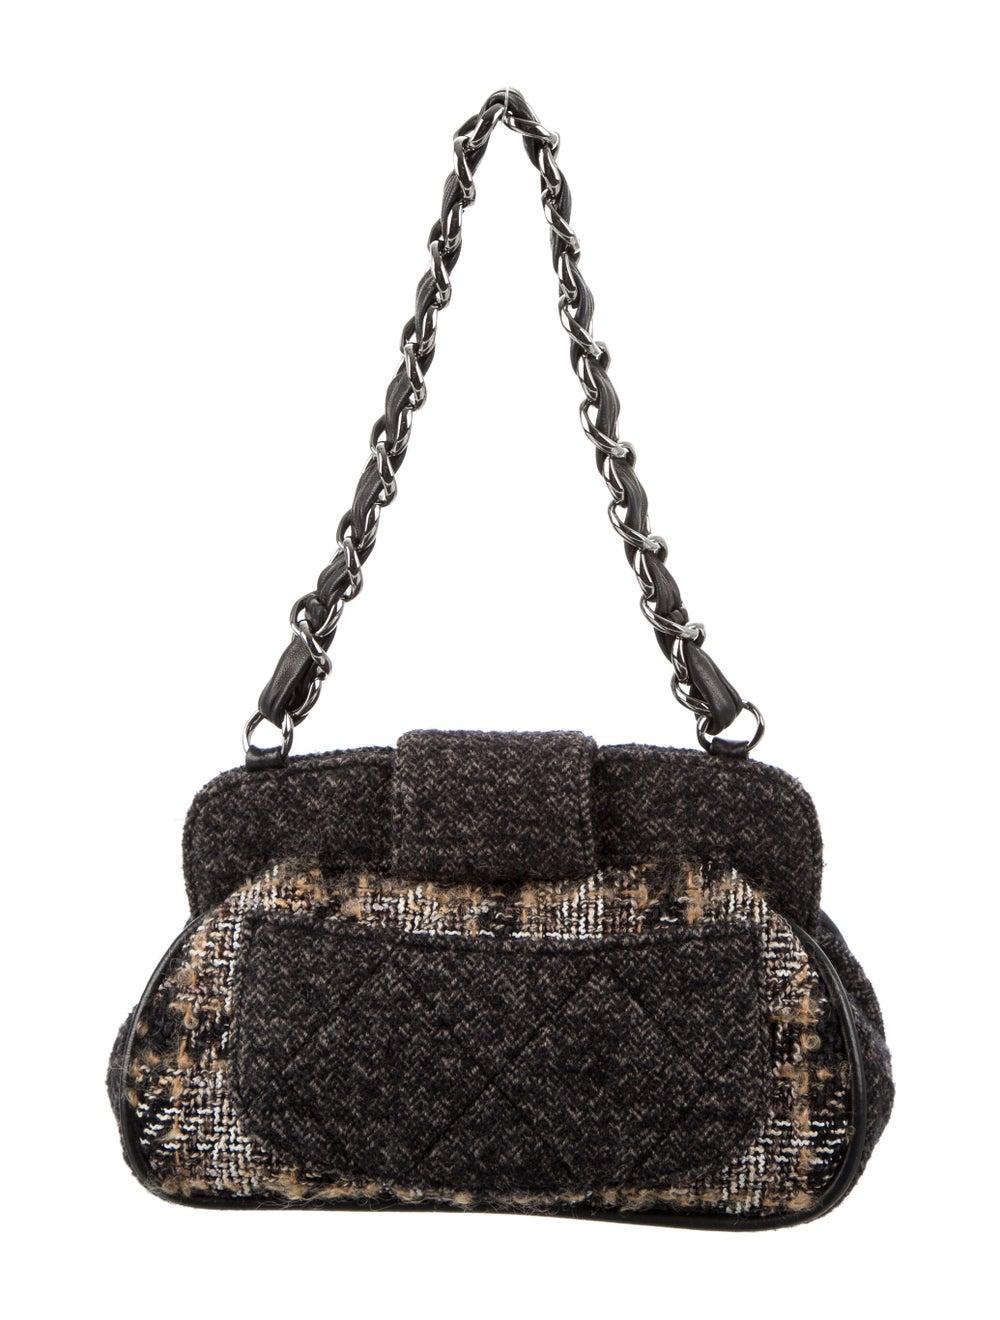 Chanel Tweed Frame Bag Brown - image 4